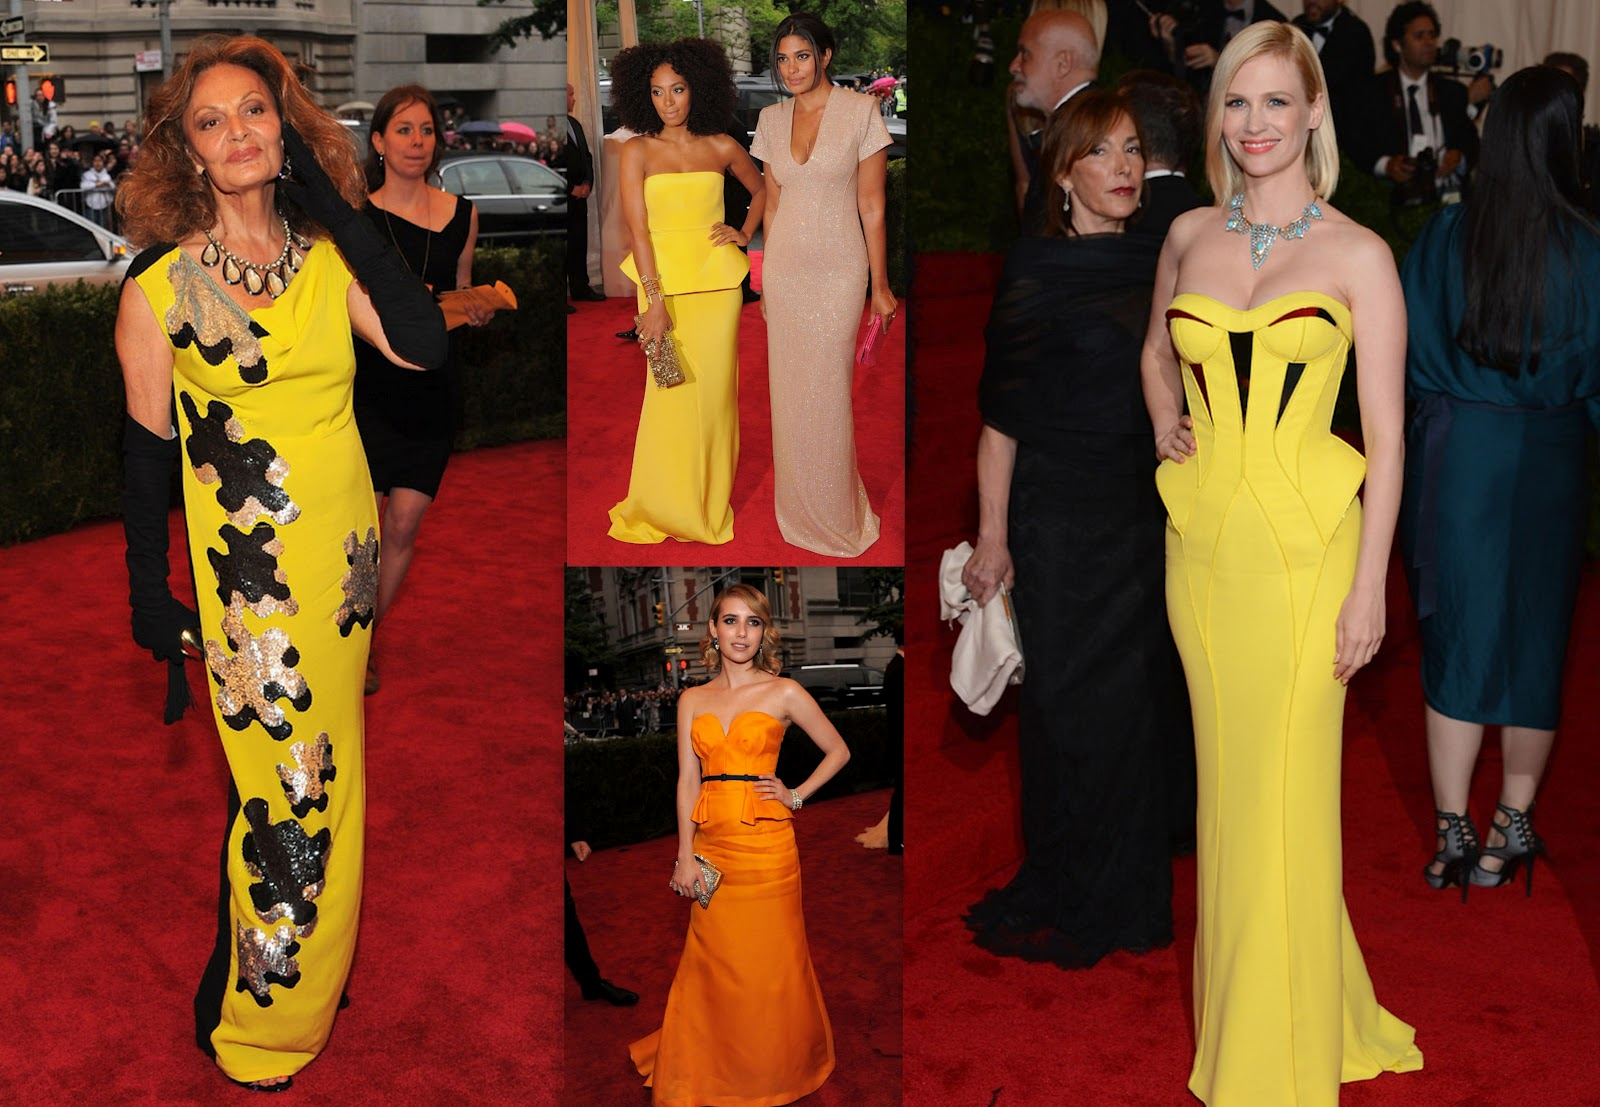 http://4.bp.blogspot.com/-0ifEk33O_Ug/T6mc-RtPO5I/AAAAAAAABNc/aMJ1tpH3hVU/s1600/moda+flish+fluquing+amarillos.jpg